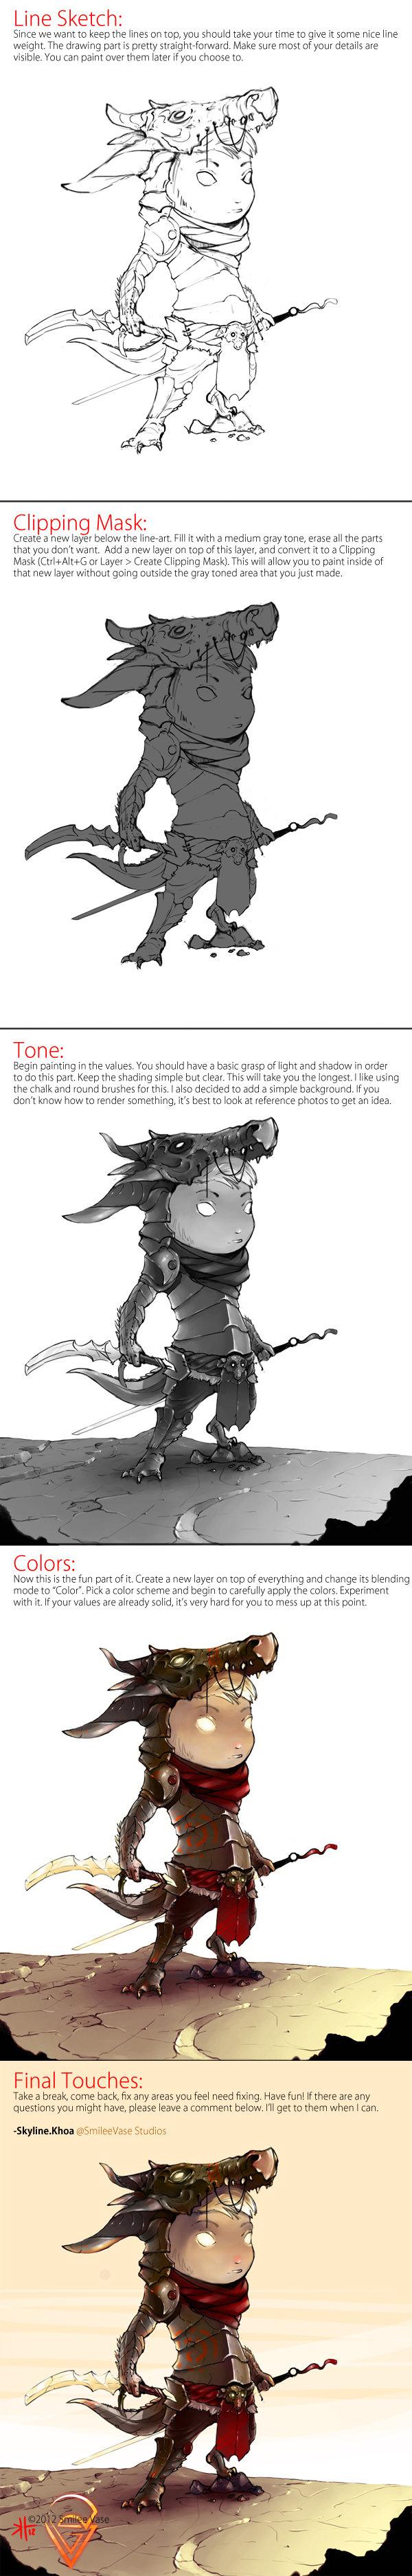 Dragon Kid - Photoshop Progress/Guide by KhoaSV